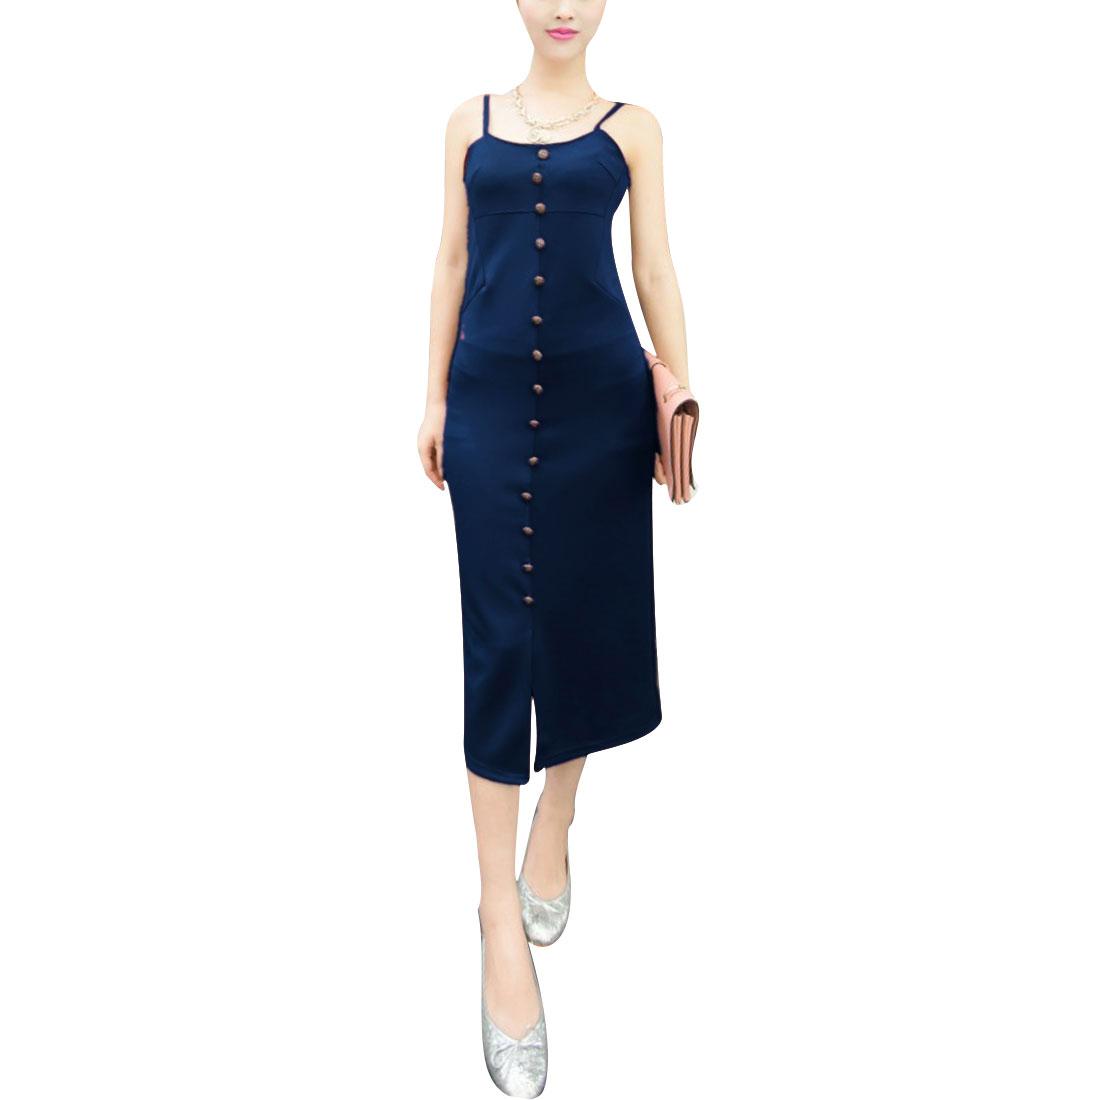 Women Spaghetti Straps Design Slim Fit Off Shoulder Summer Dress Navy Blue XS